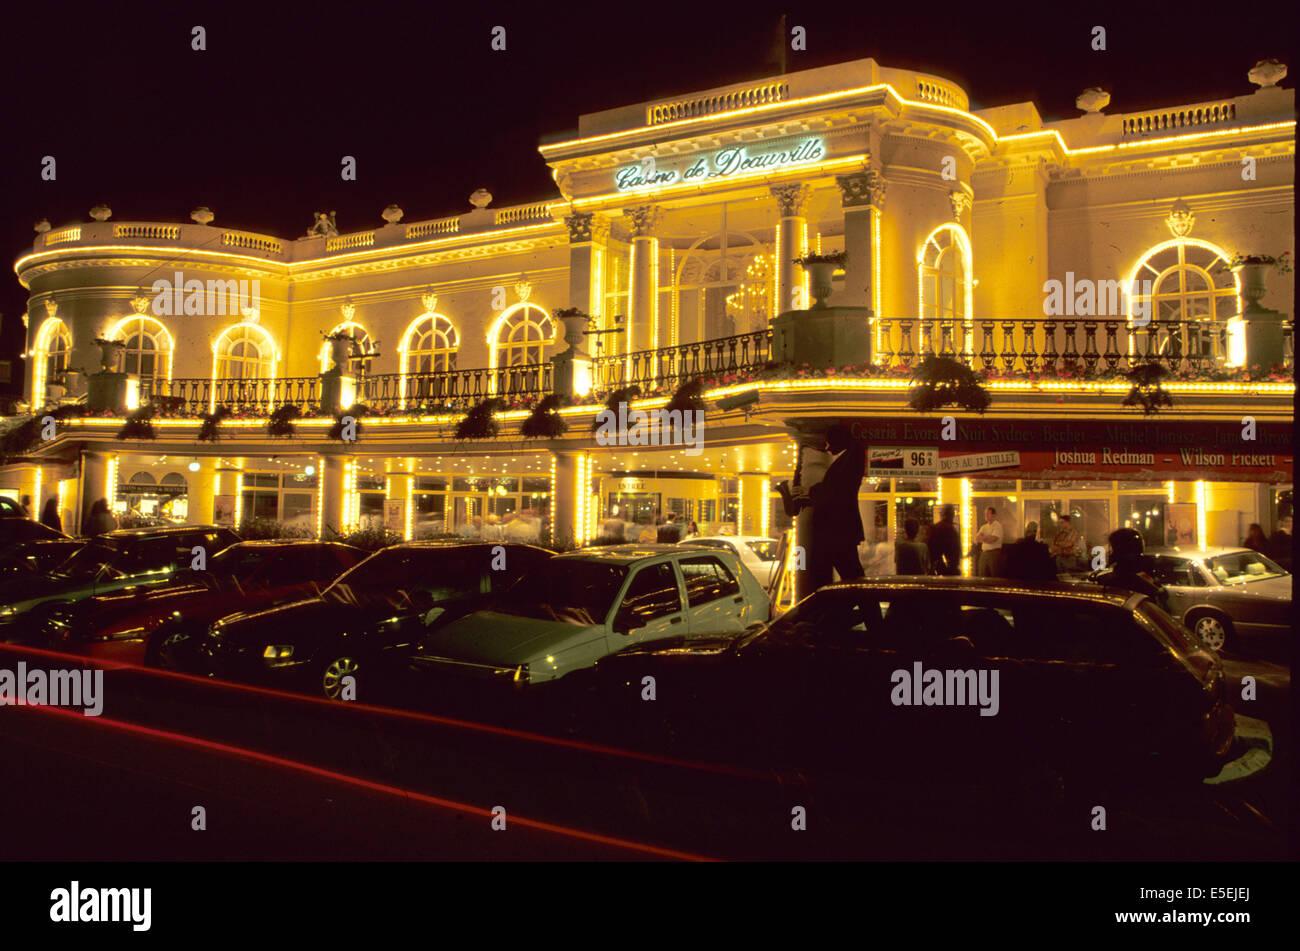 Hotel casino calvados poker hellmuth